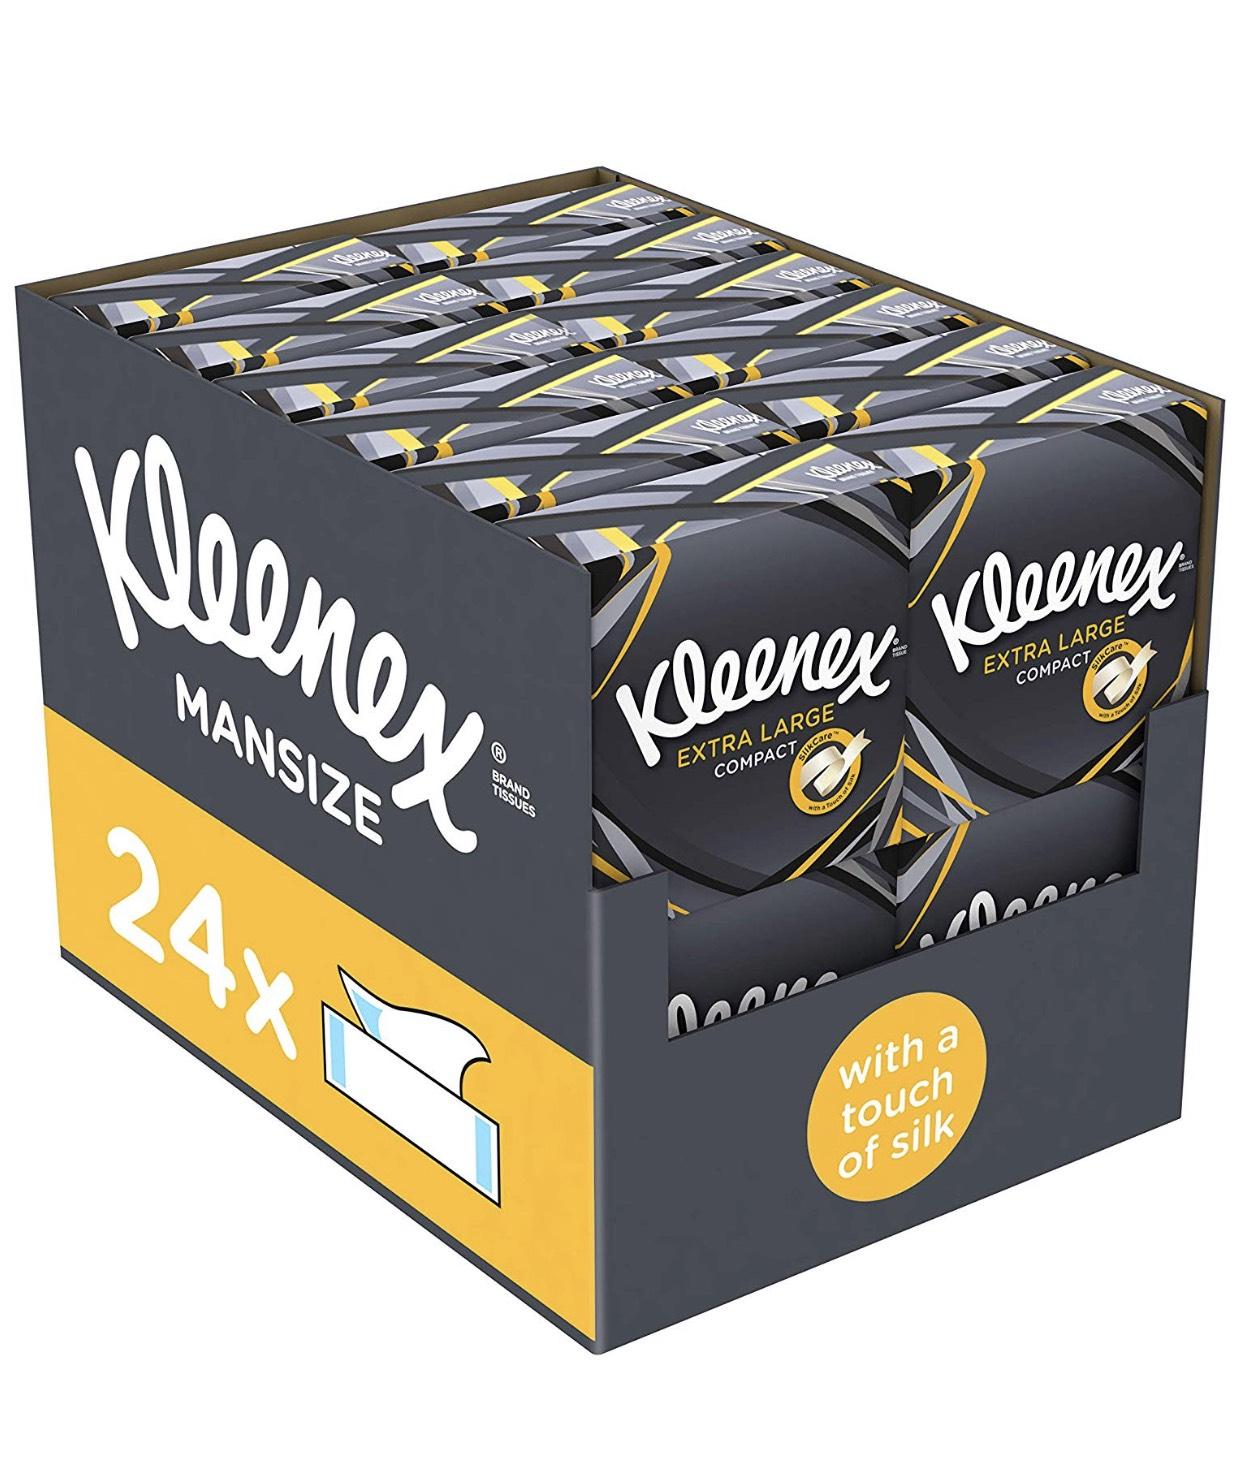 Kleenex Extra Large Mansize Tissues x 24 boxes £14.49 (Prime) / £18.98 (non Prime) Amazon = 60 pence per box!